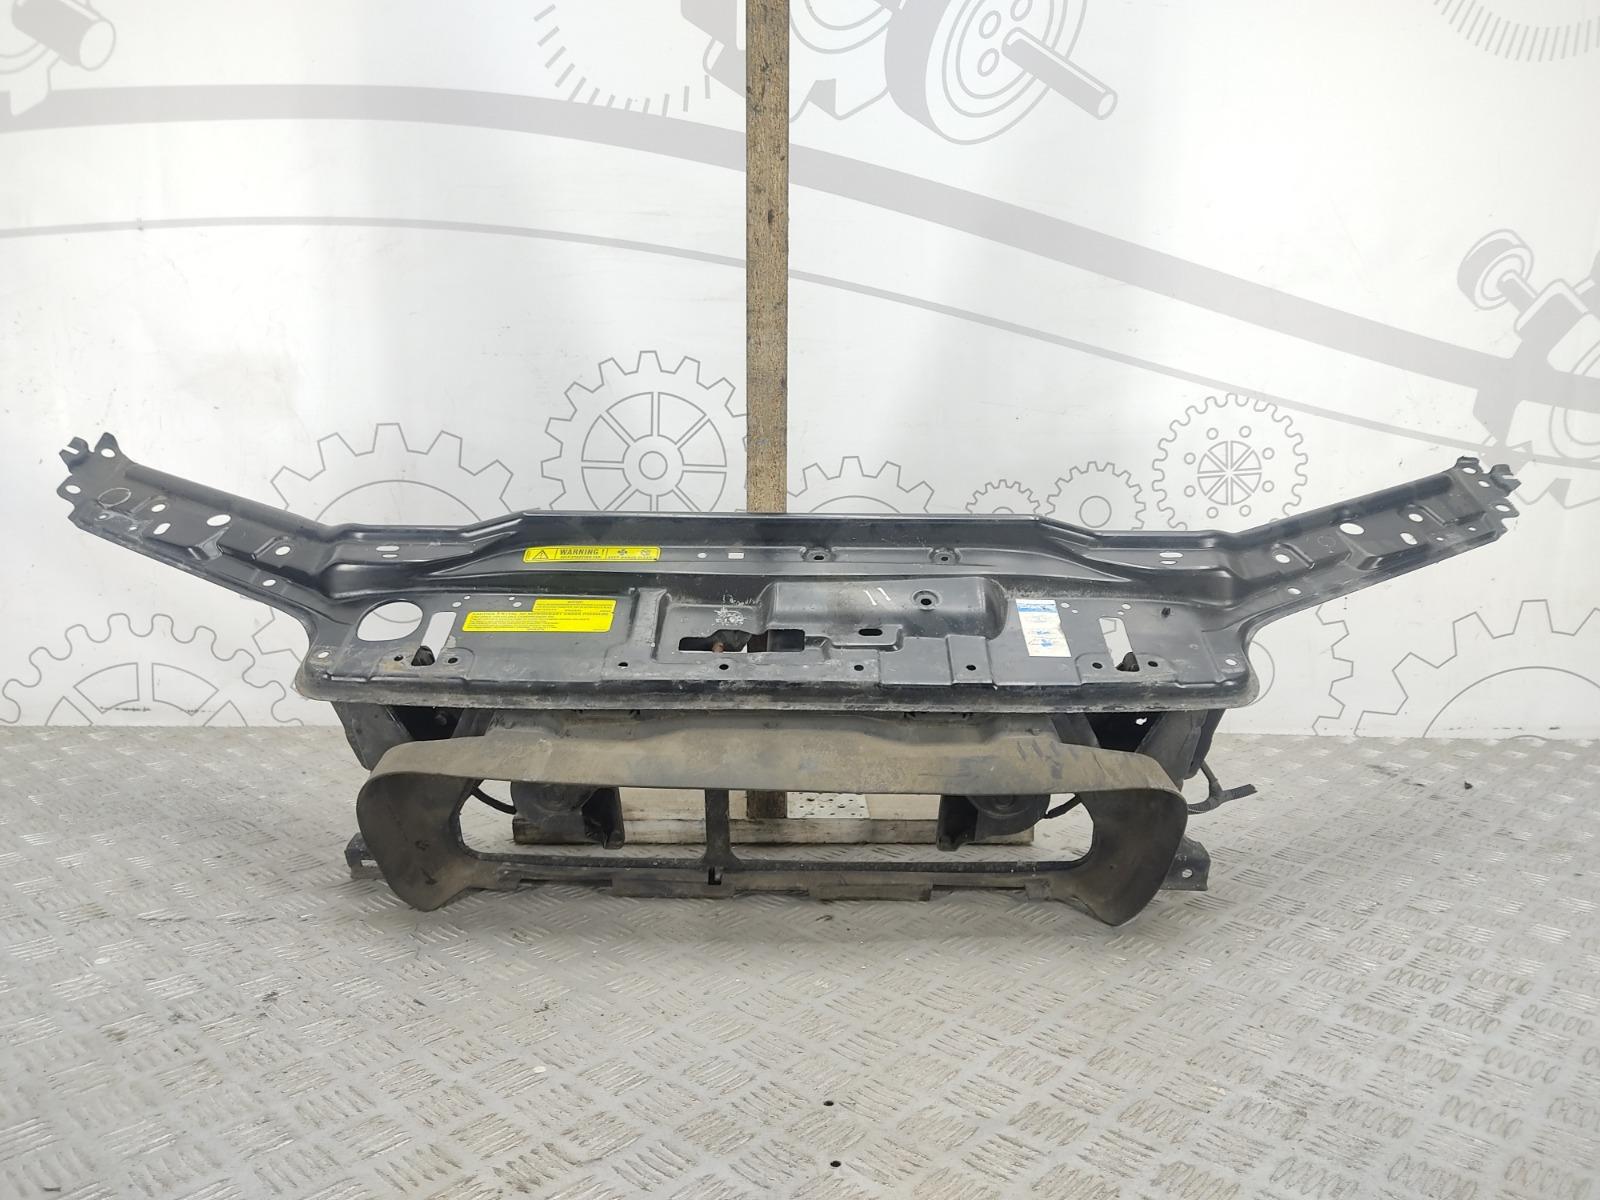 Панель передняя (телевизор) Volvo S60 2.4 D5 2004 (б/у)